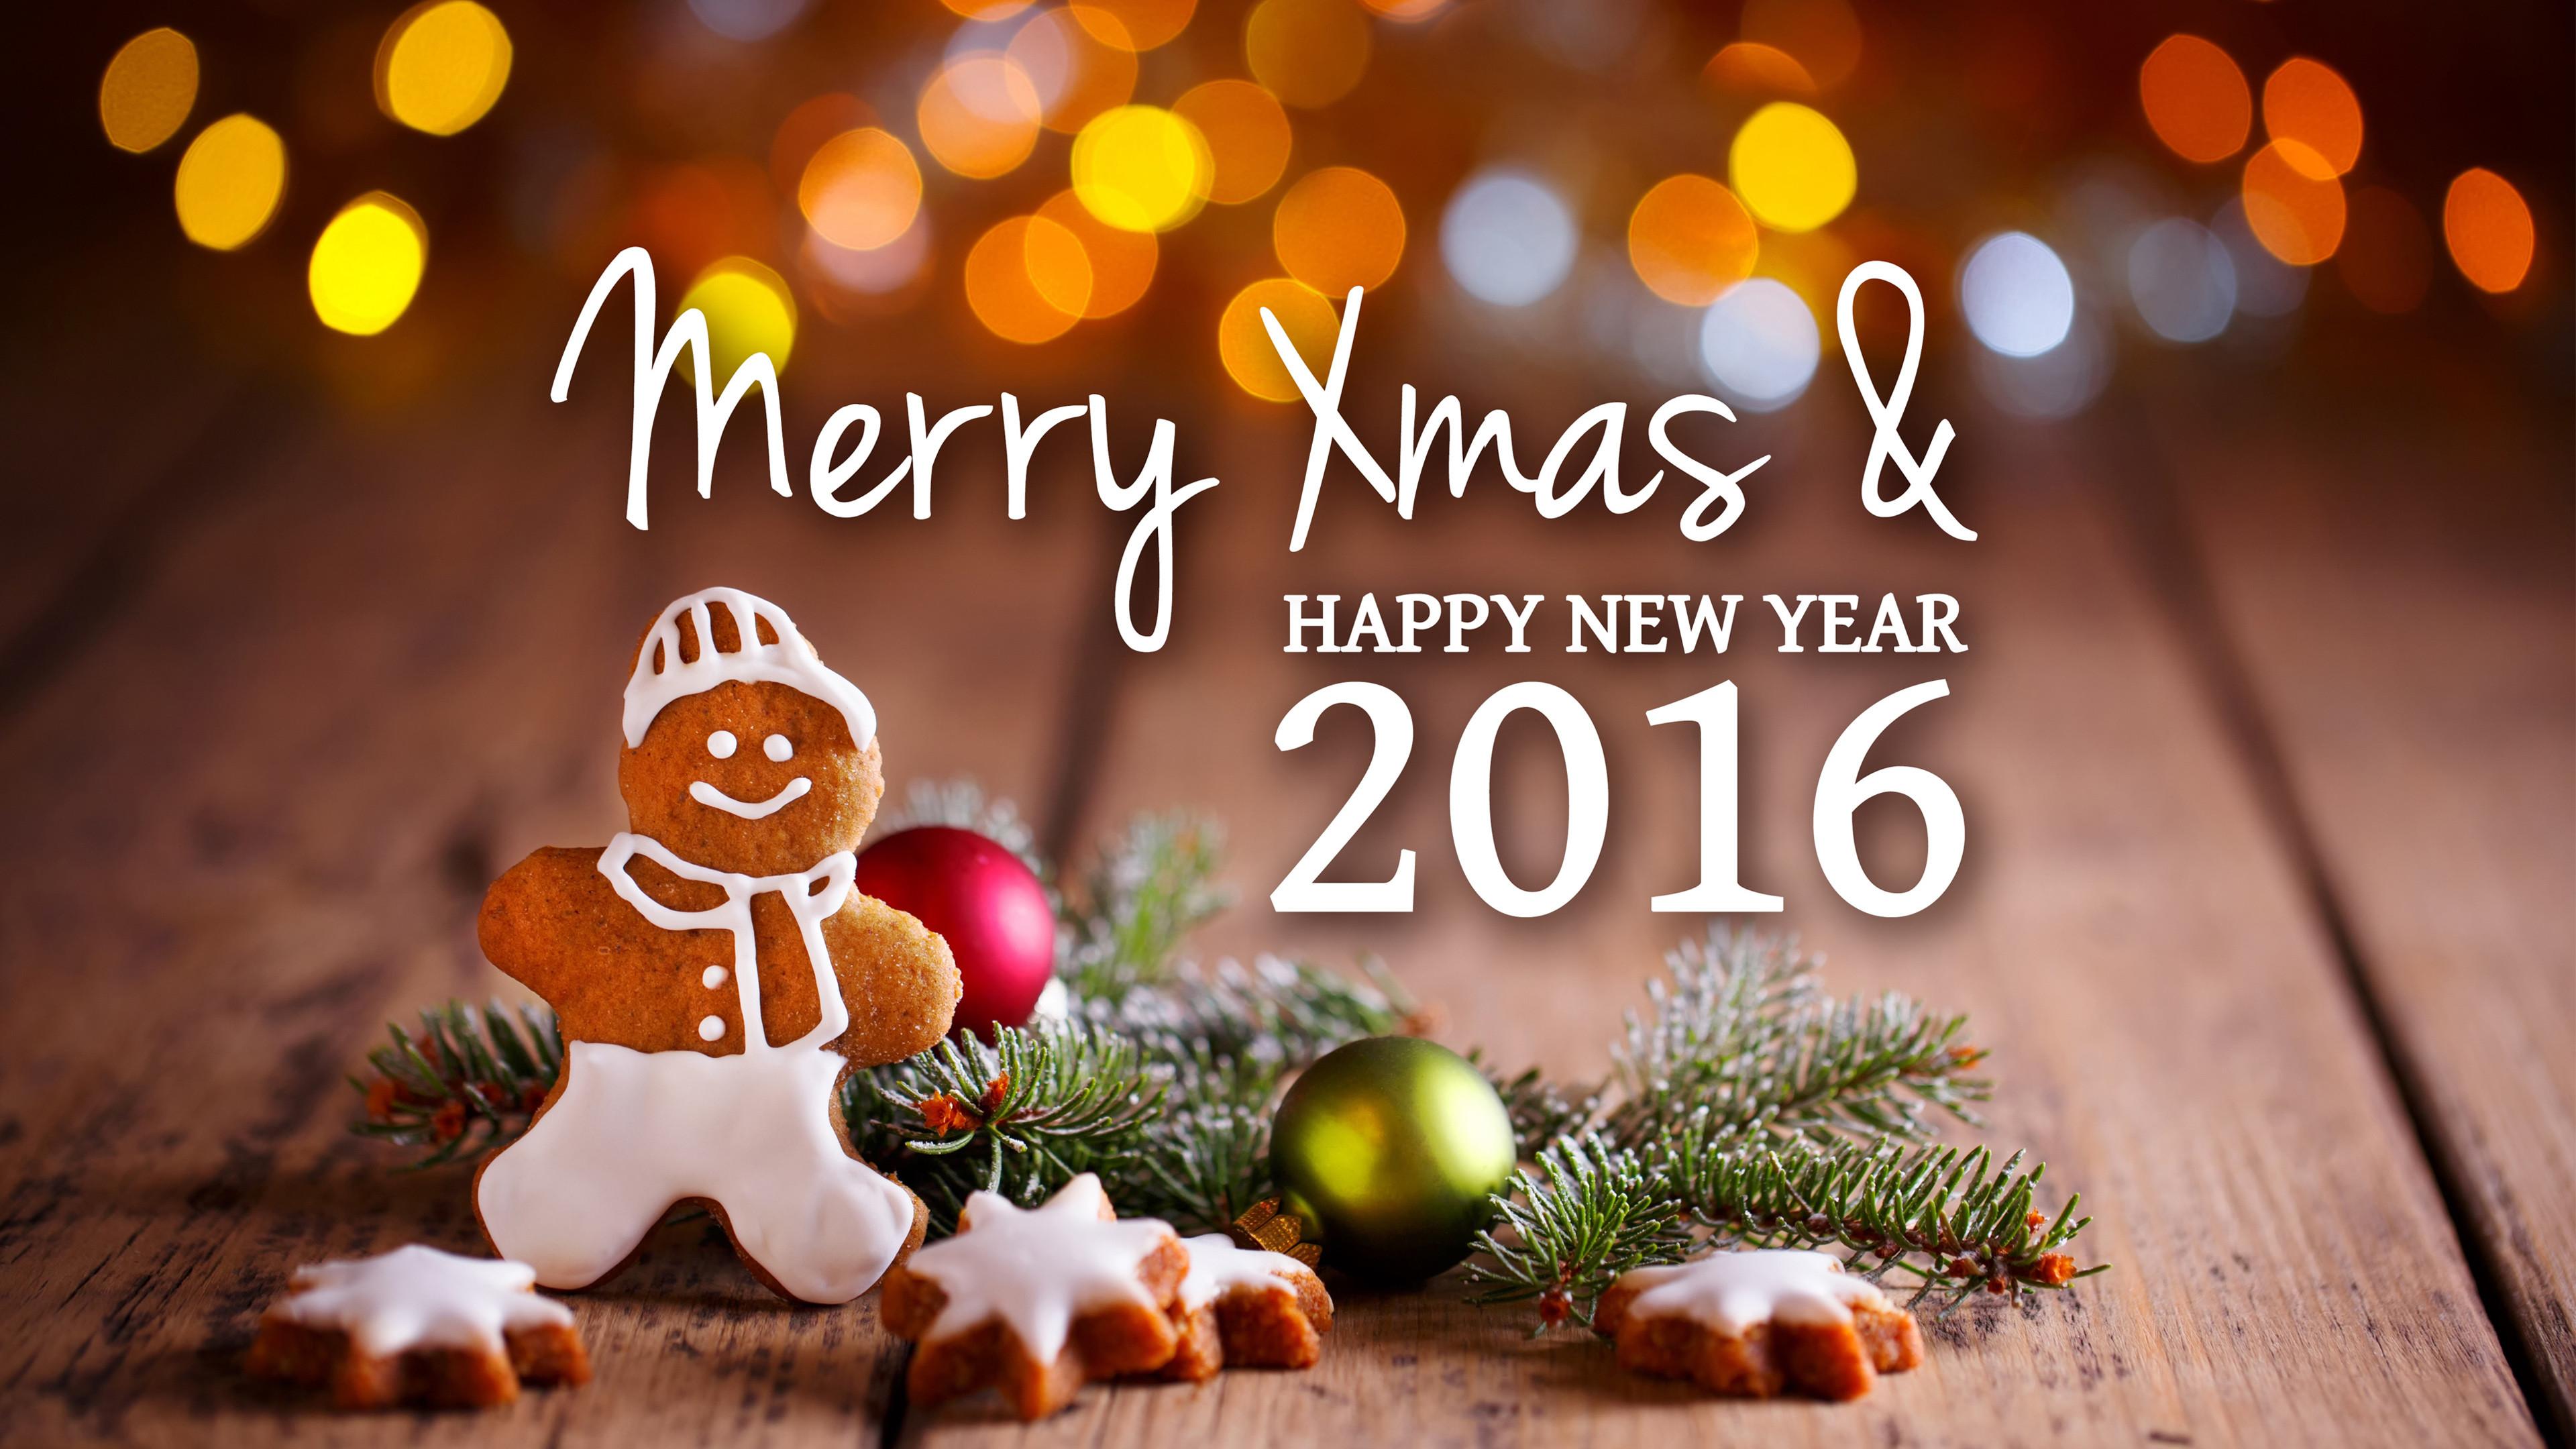 Merry Christmas 2016 Wallpaper